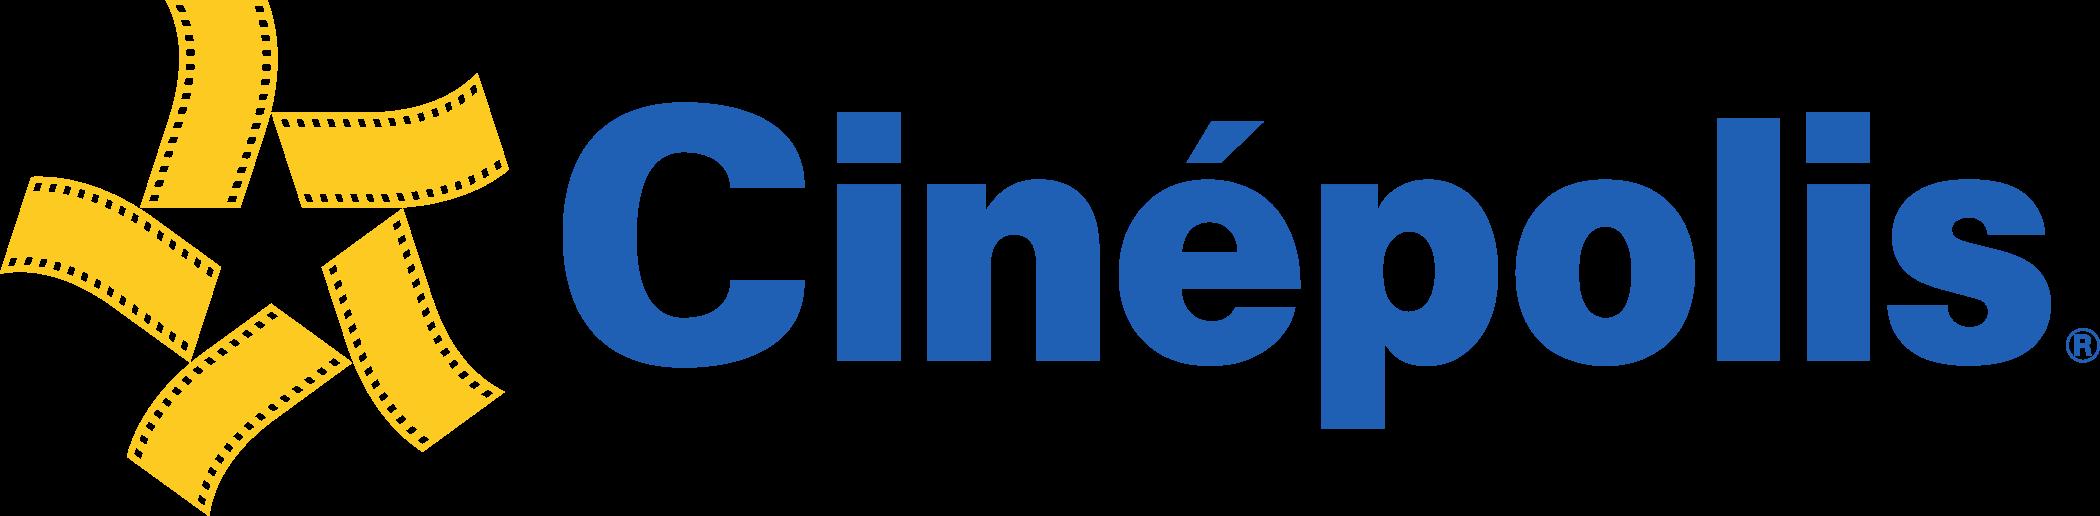 Cinépolis logo.